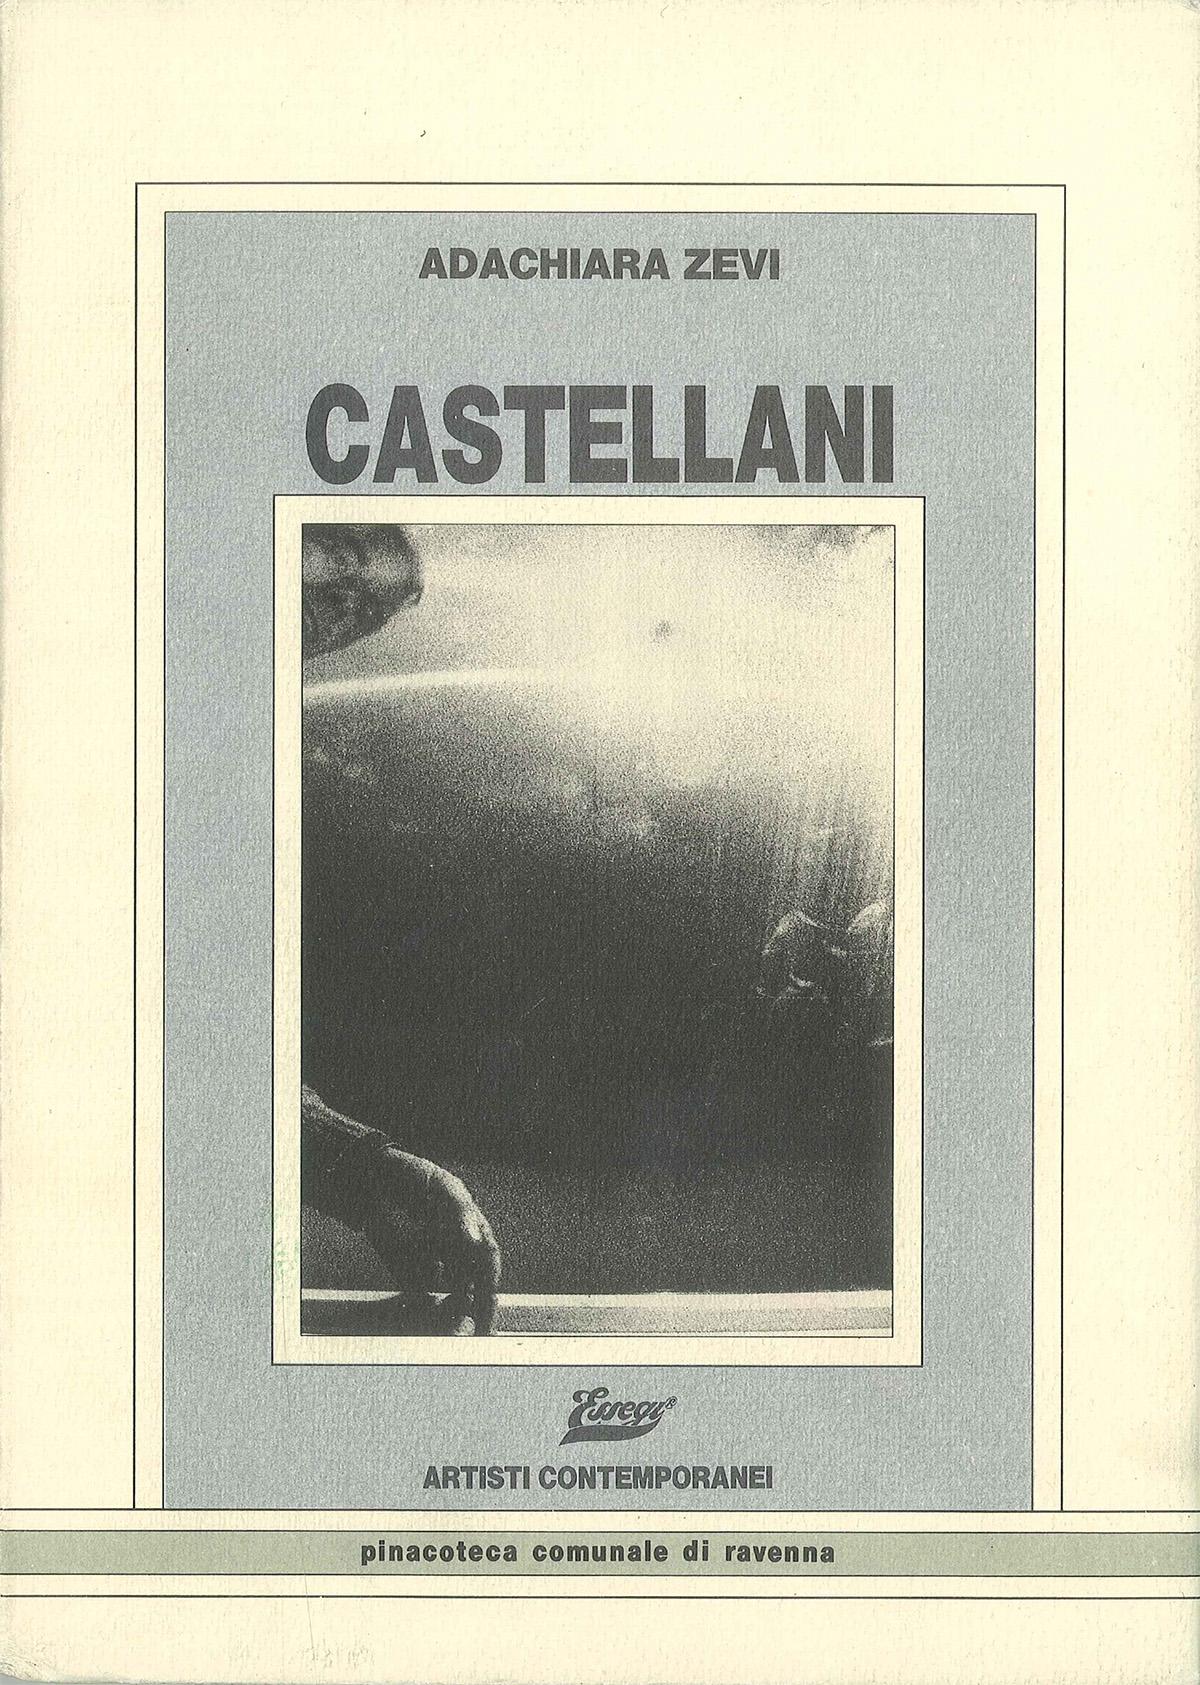 Copertina - Castellani, Adachiara Zevi, 1984, Pinacoteca Comunale - Loggetta Lombardesca, Essegi Edizioni, Ravenna